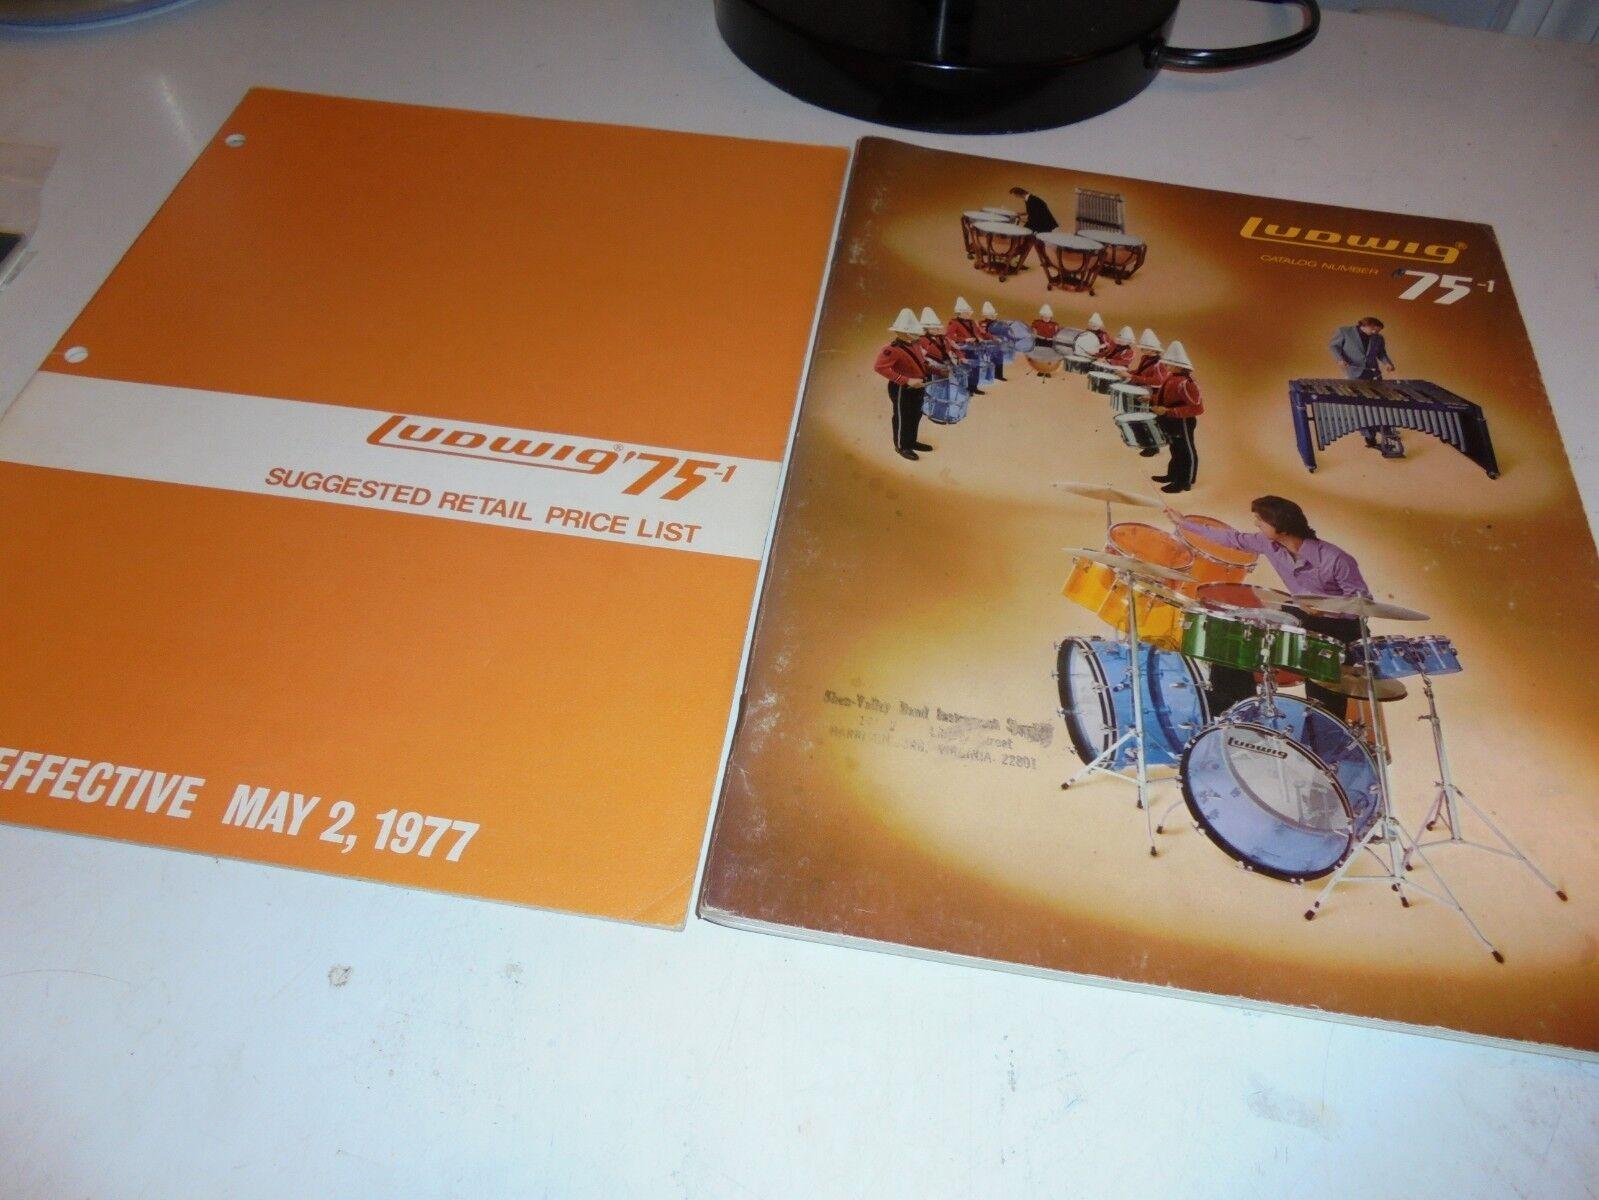 VINTAGE LUDWIG 75-1 DRUM CATALOG-VISTALITE DEBUT JELLY BEAN KIT-PRICE LIST-EXCEL